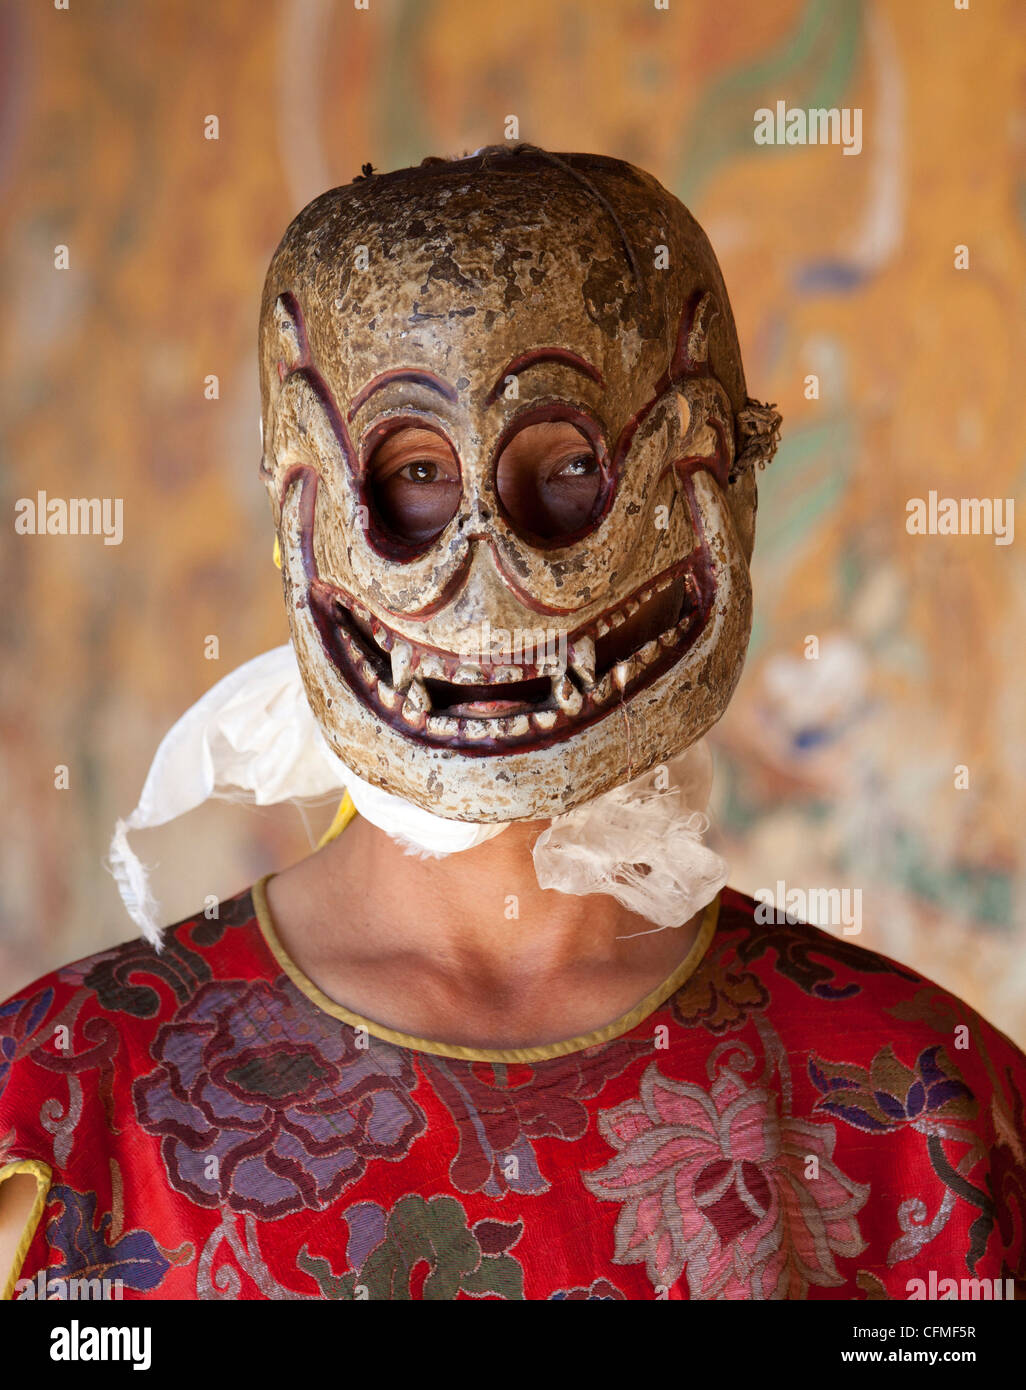 Buddhist monk wearing carved wooden mask, Jakar, Bumthang, Bhutan, Asia - Stock Image